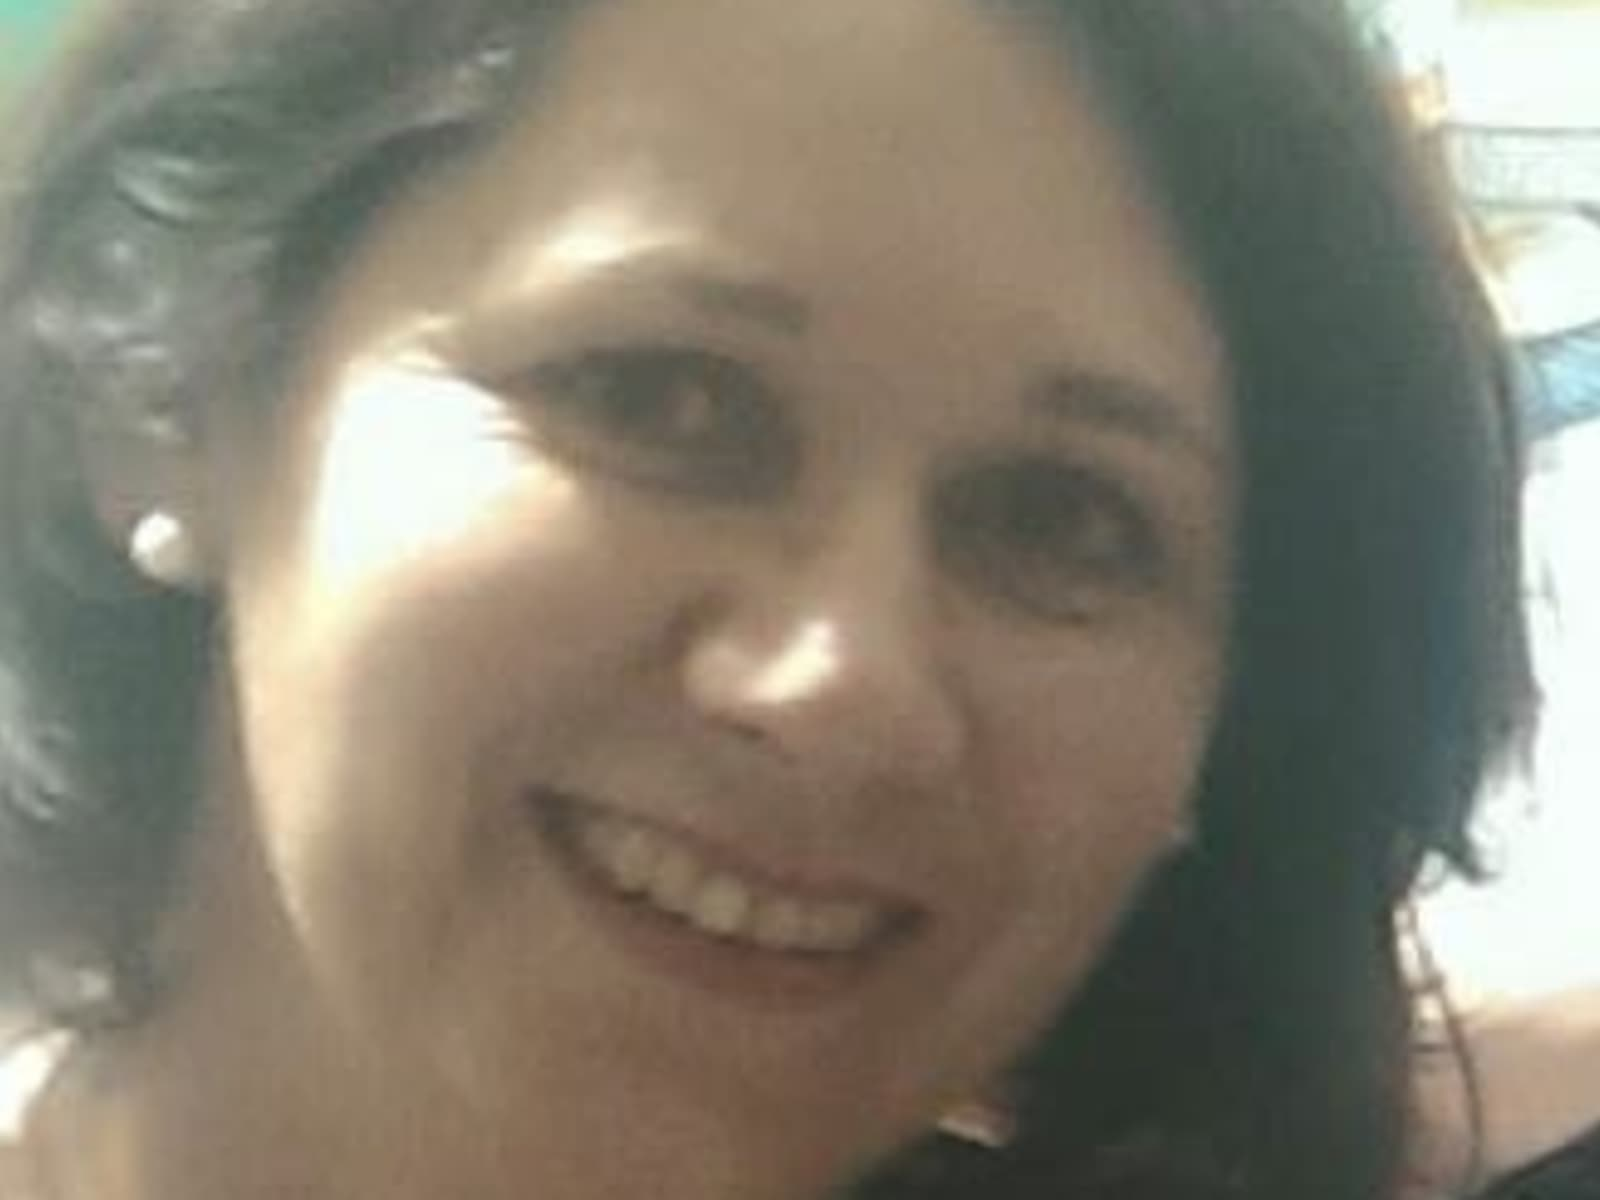 Jennifer from Tannum Sands, Queensland, Australia